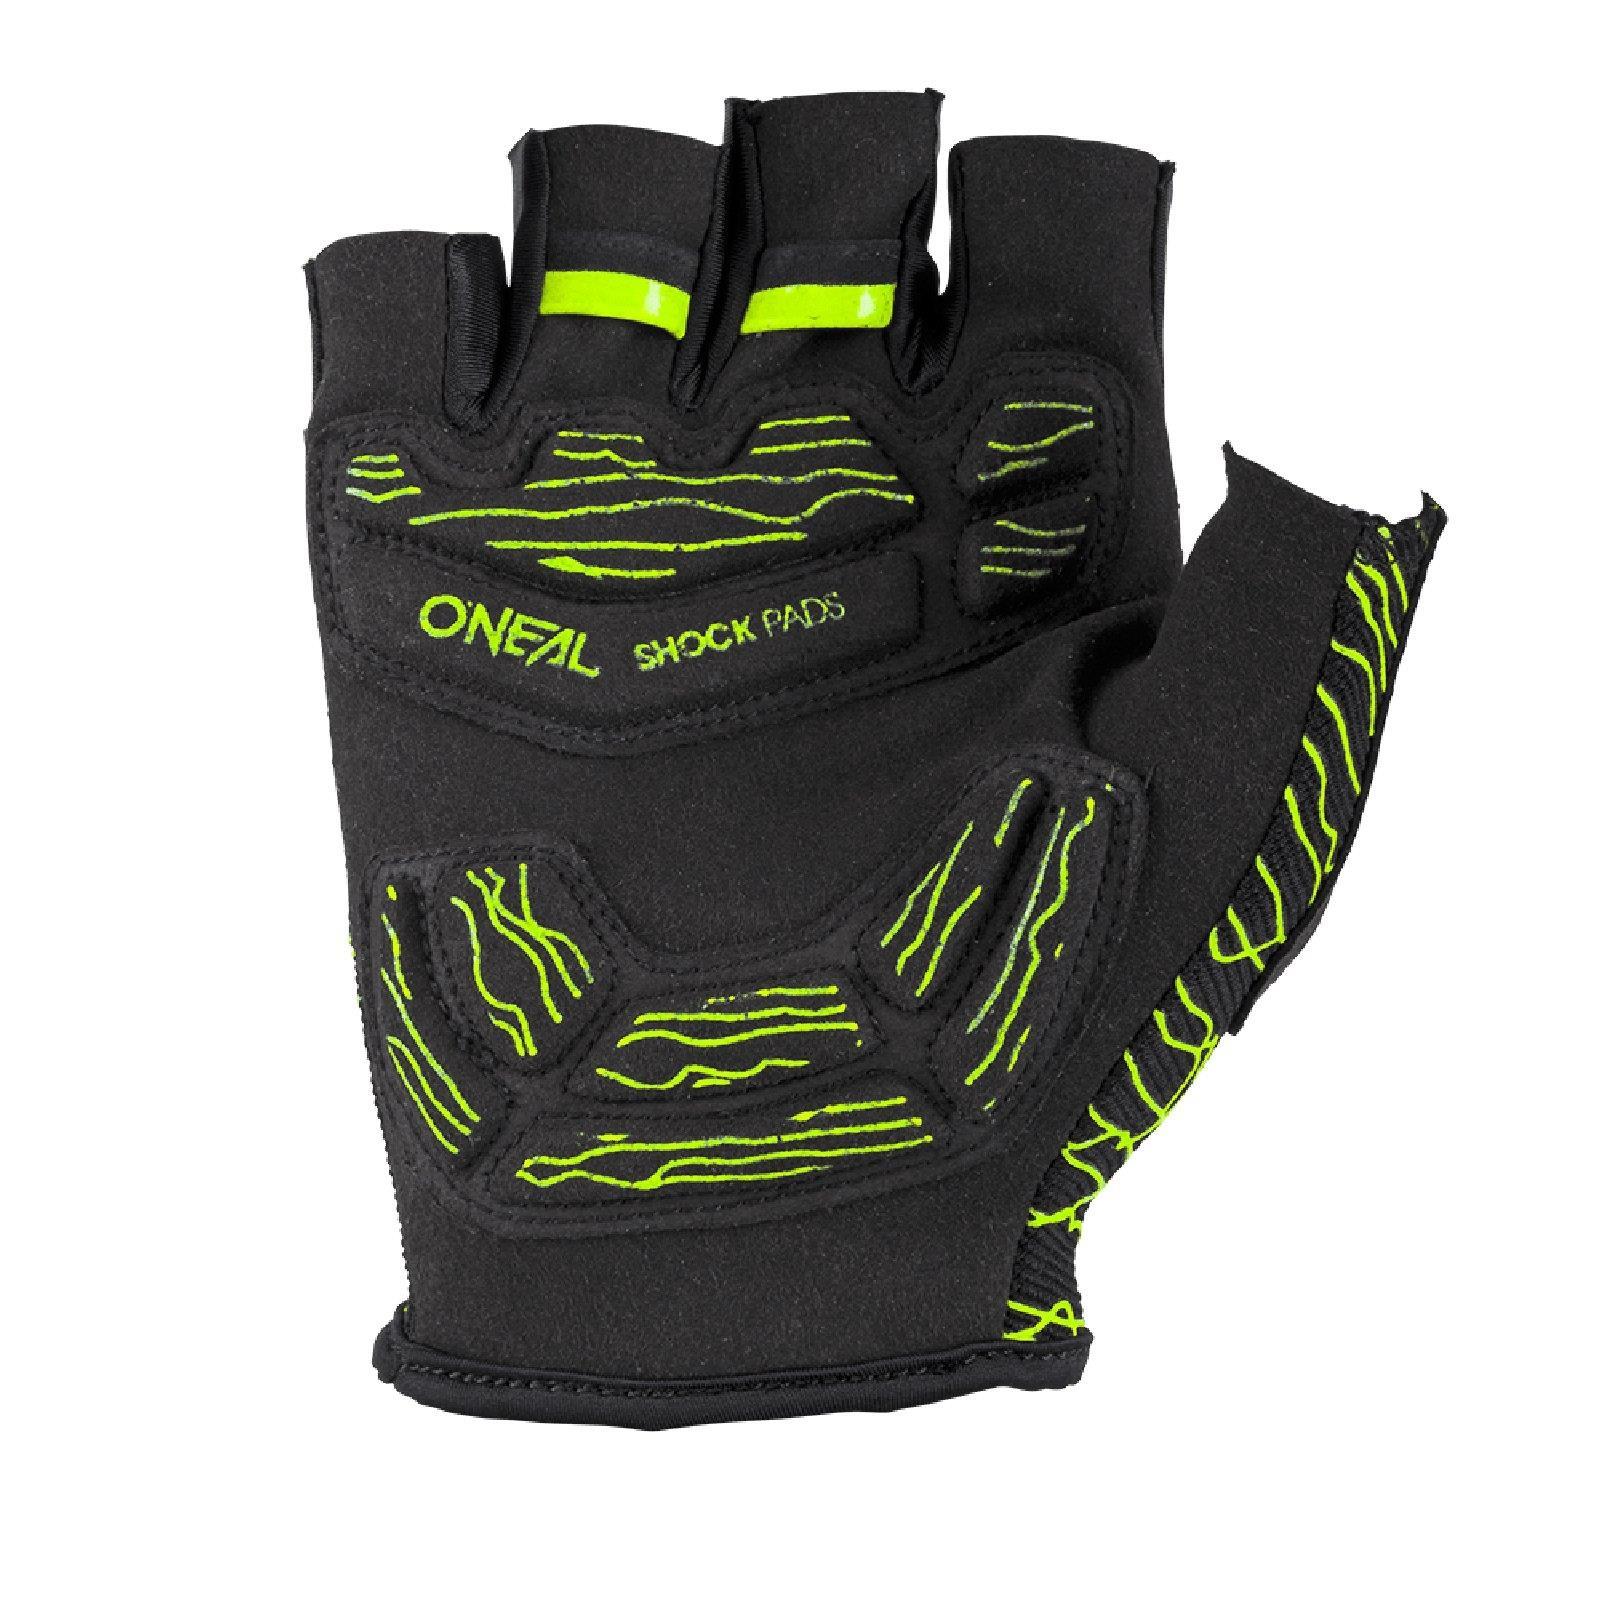 Oneal-Wired-gel-brevemente-dedos-Guantes-de-bicicleta-enduro-mountainbike-viajes-MTB miniatura 5